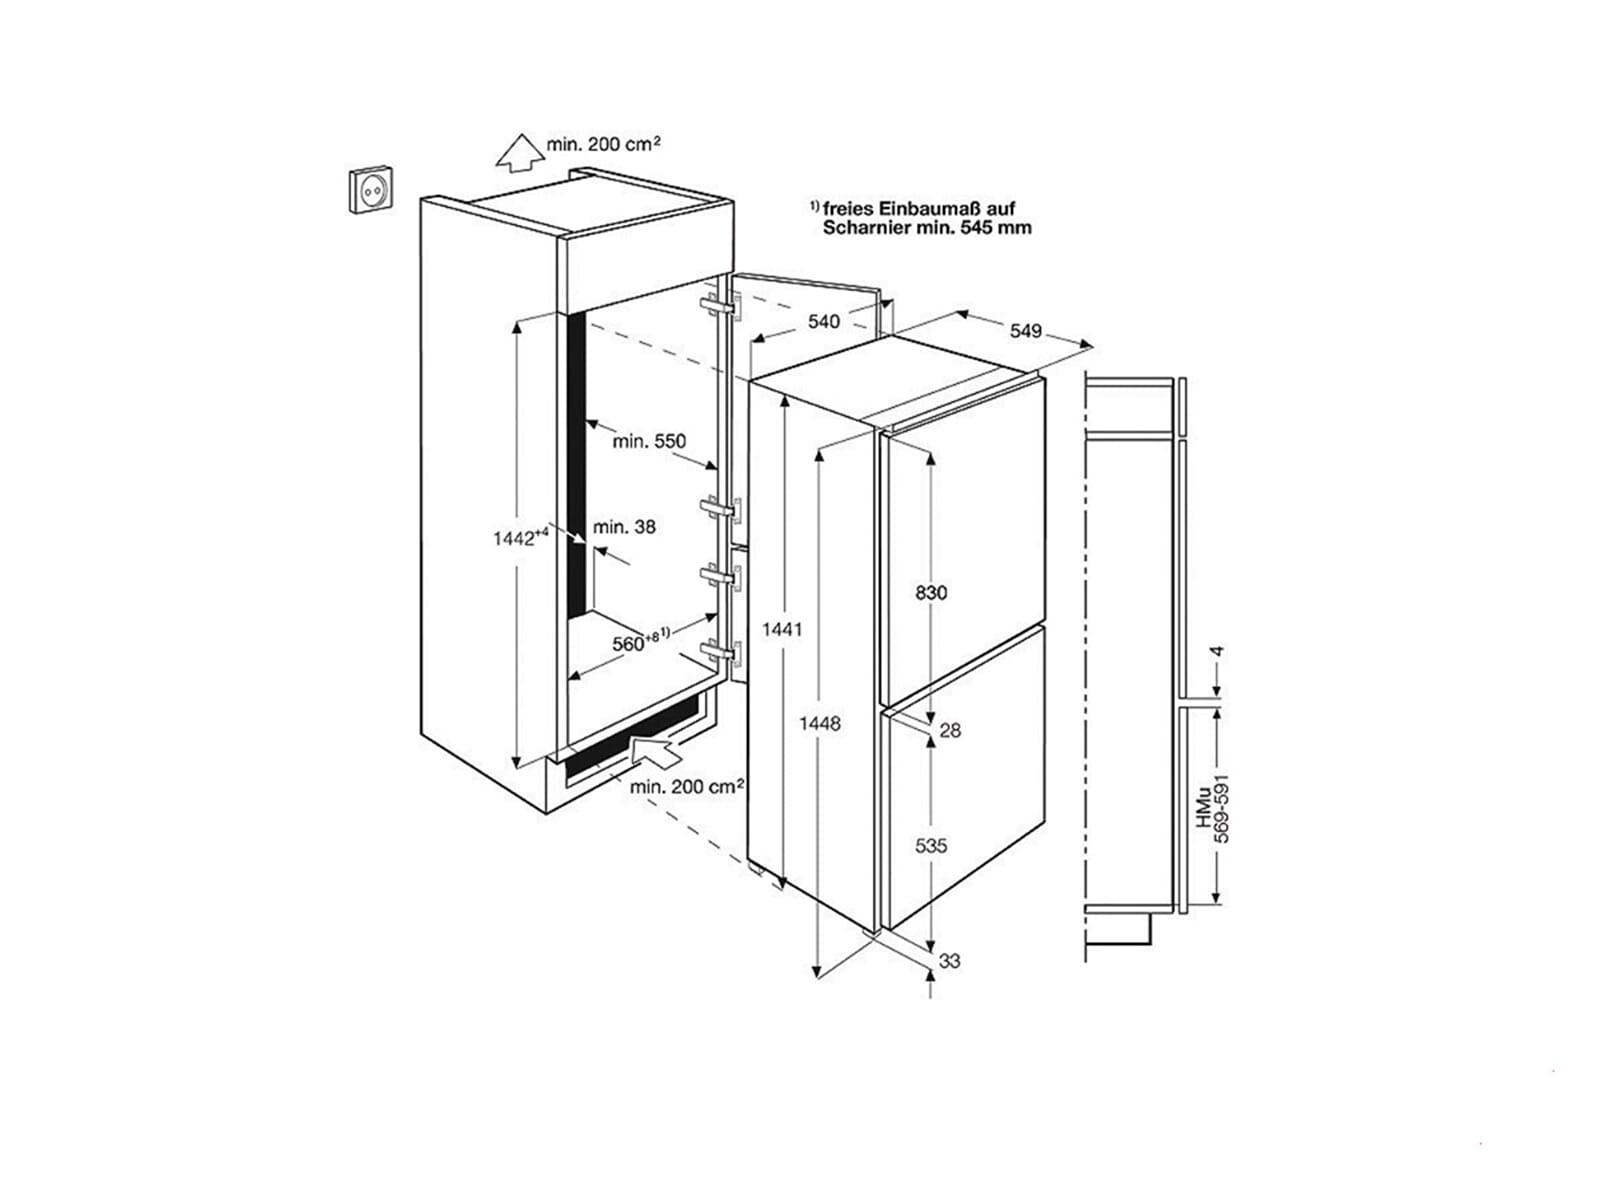 aeg scs51400s1 einbau k hl gefrier kombination k hlschrank gefrierteil 145cm a ebay. Black Bedroom Furniture Sets. Home Design Ideas